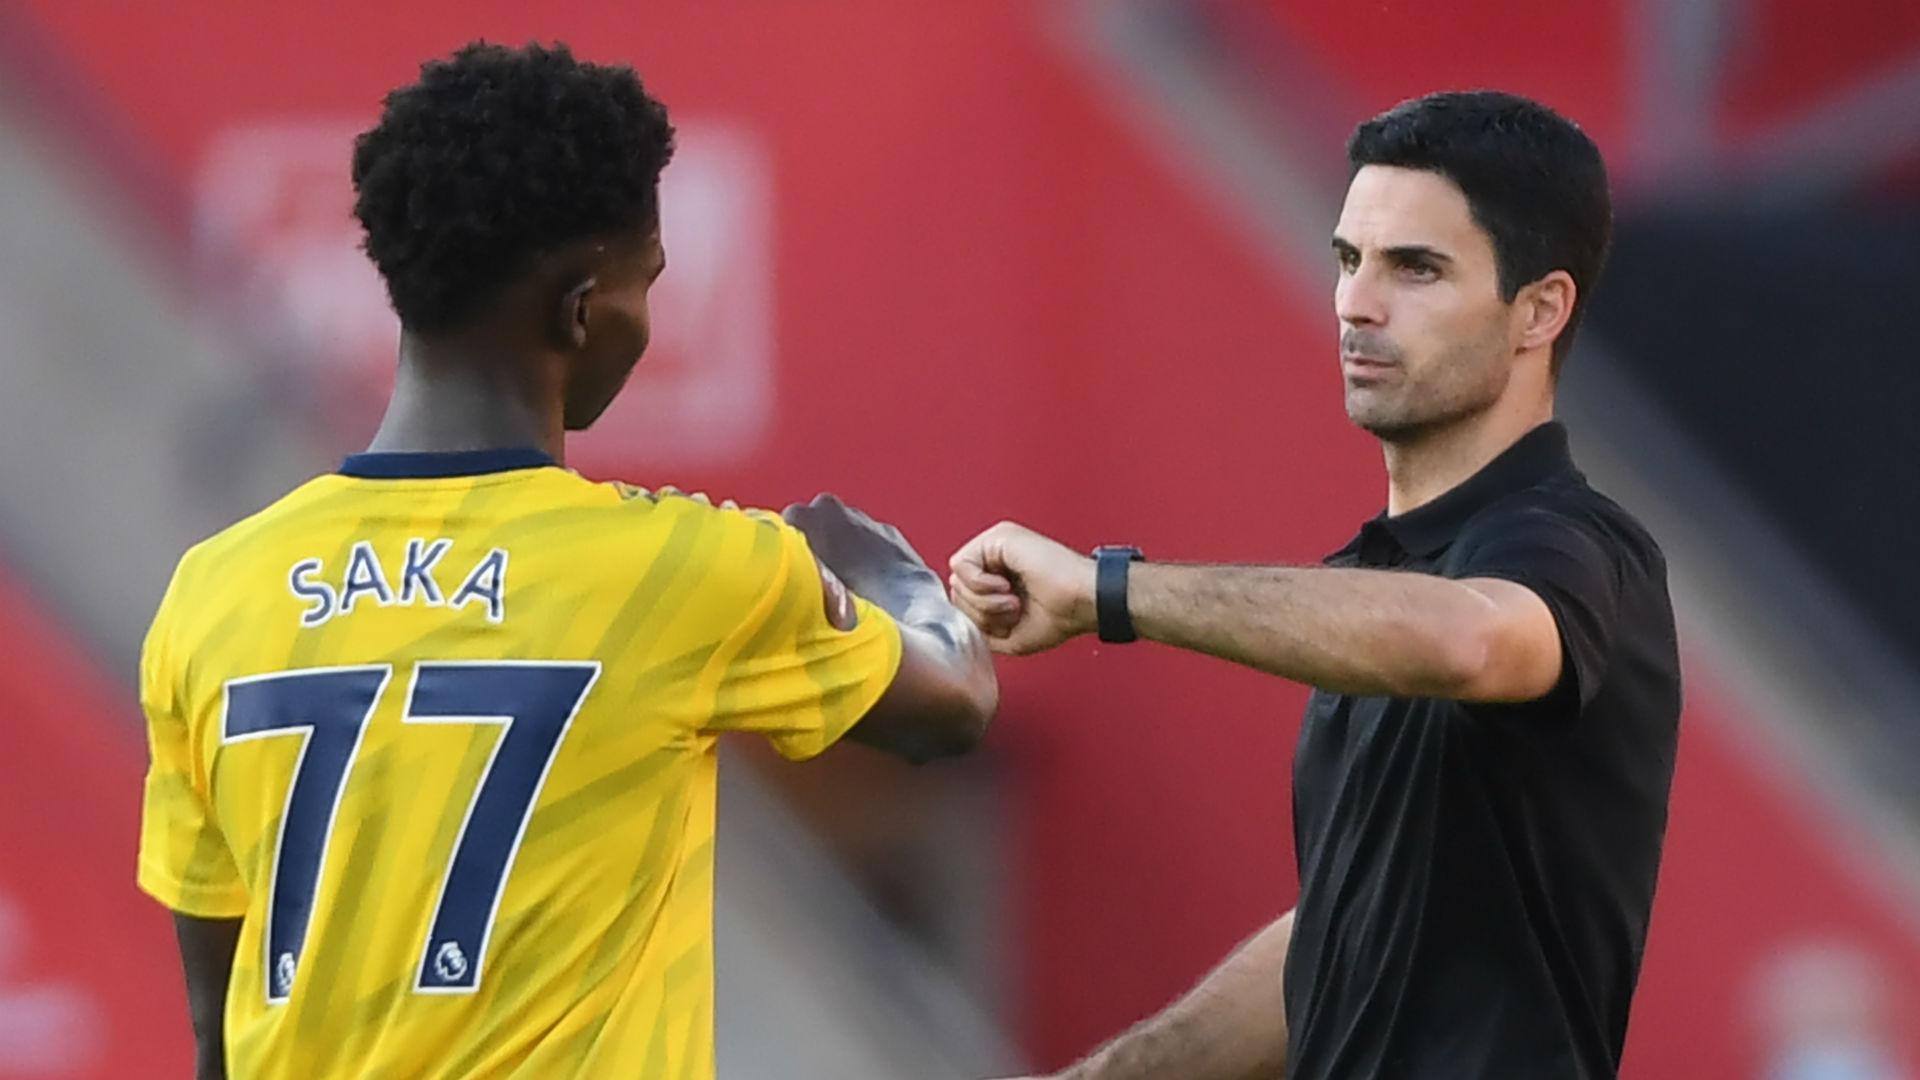 Arteta backs Saka's England invitation